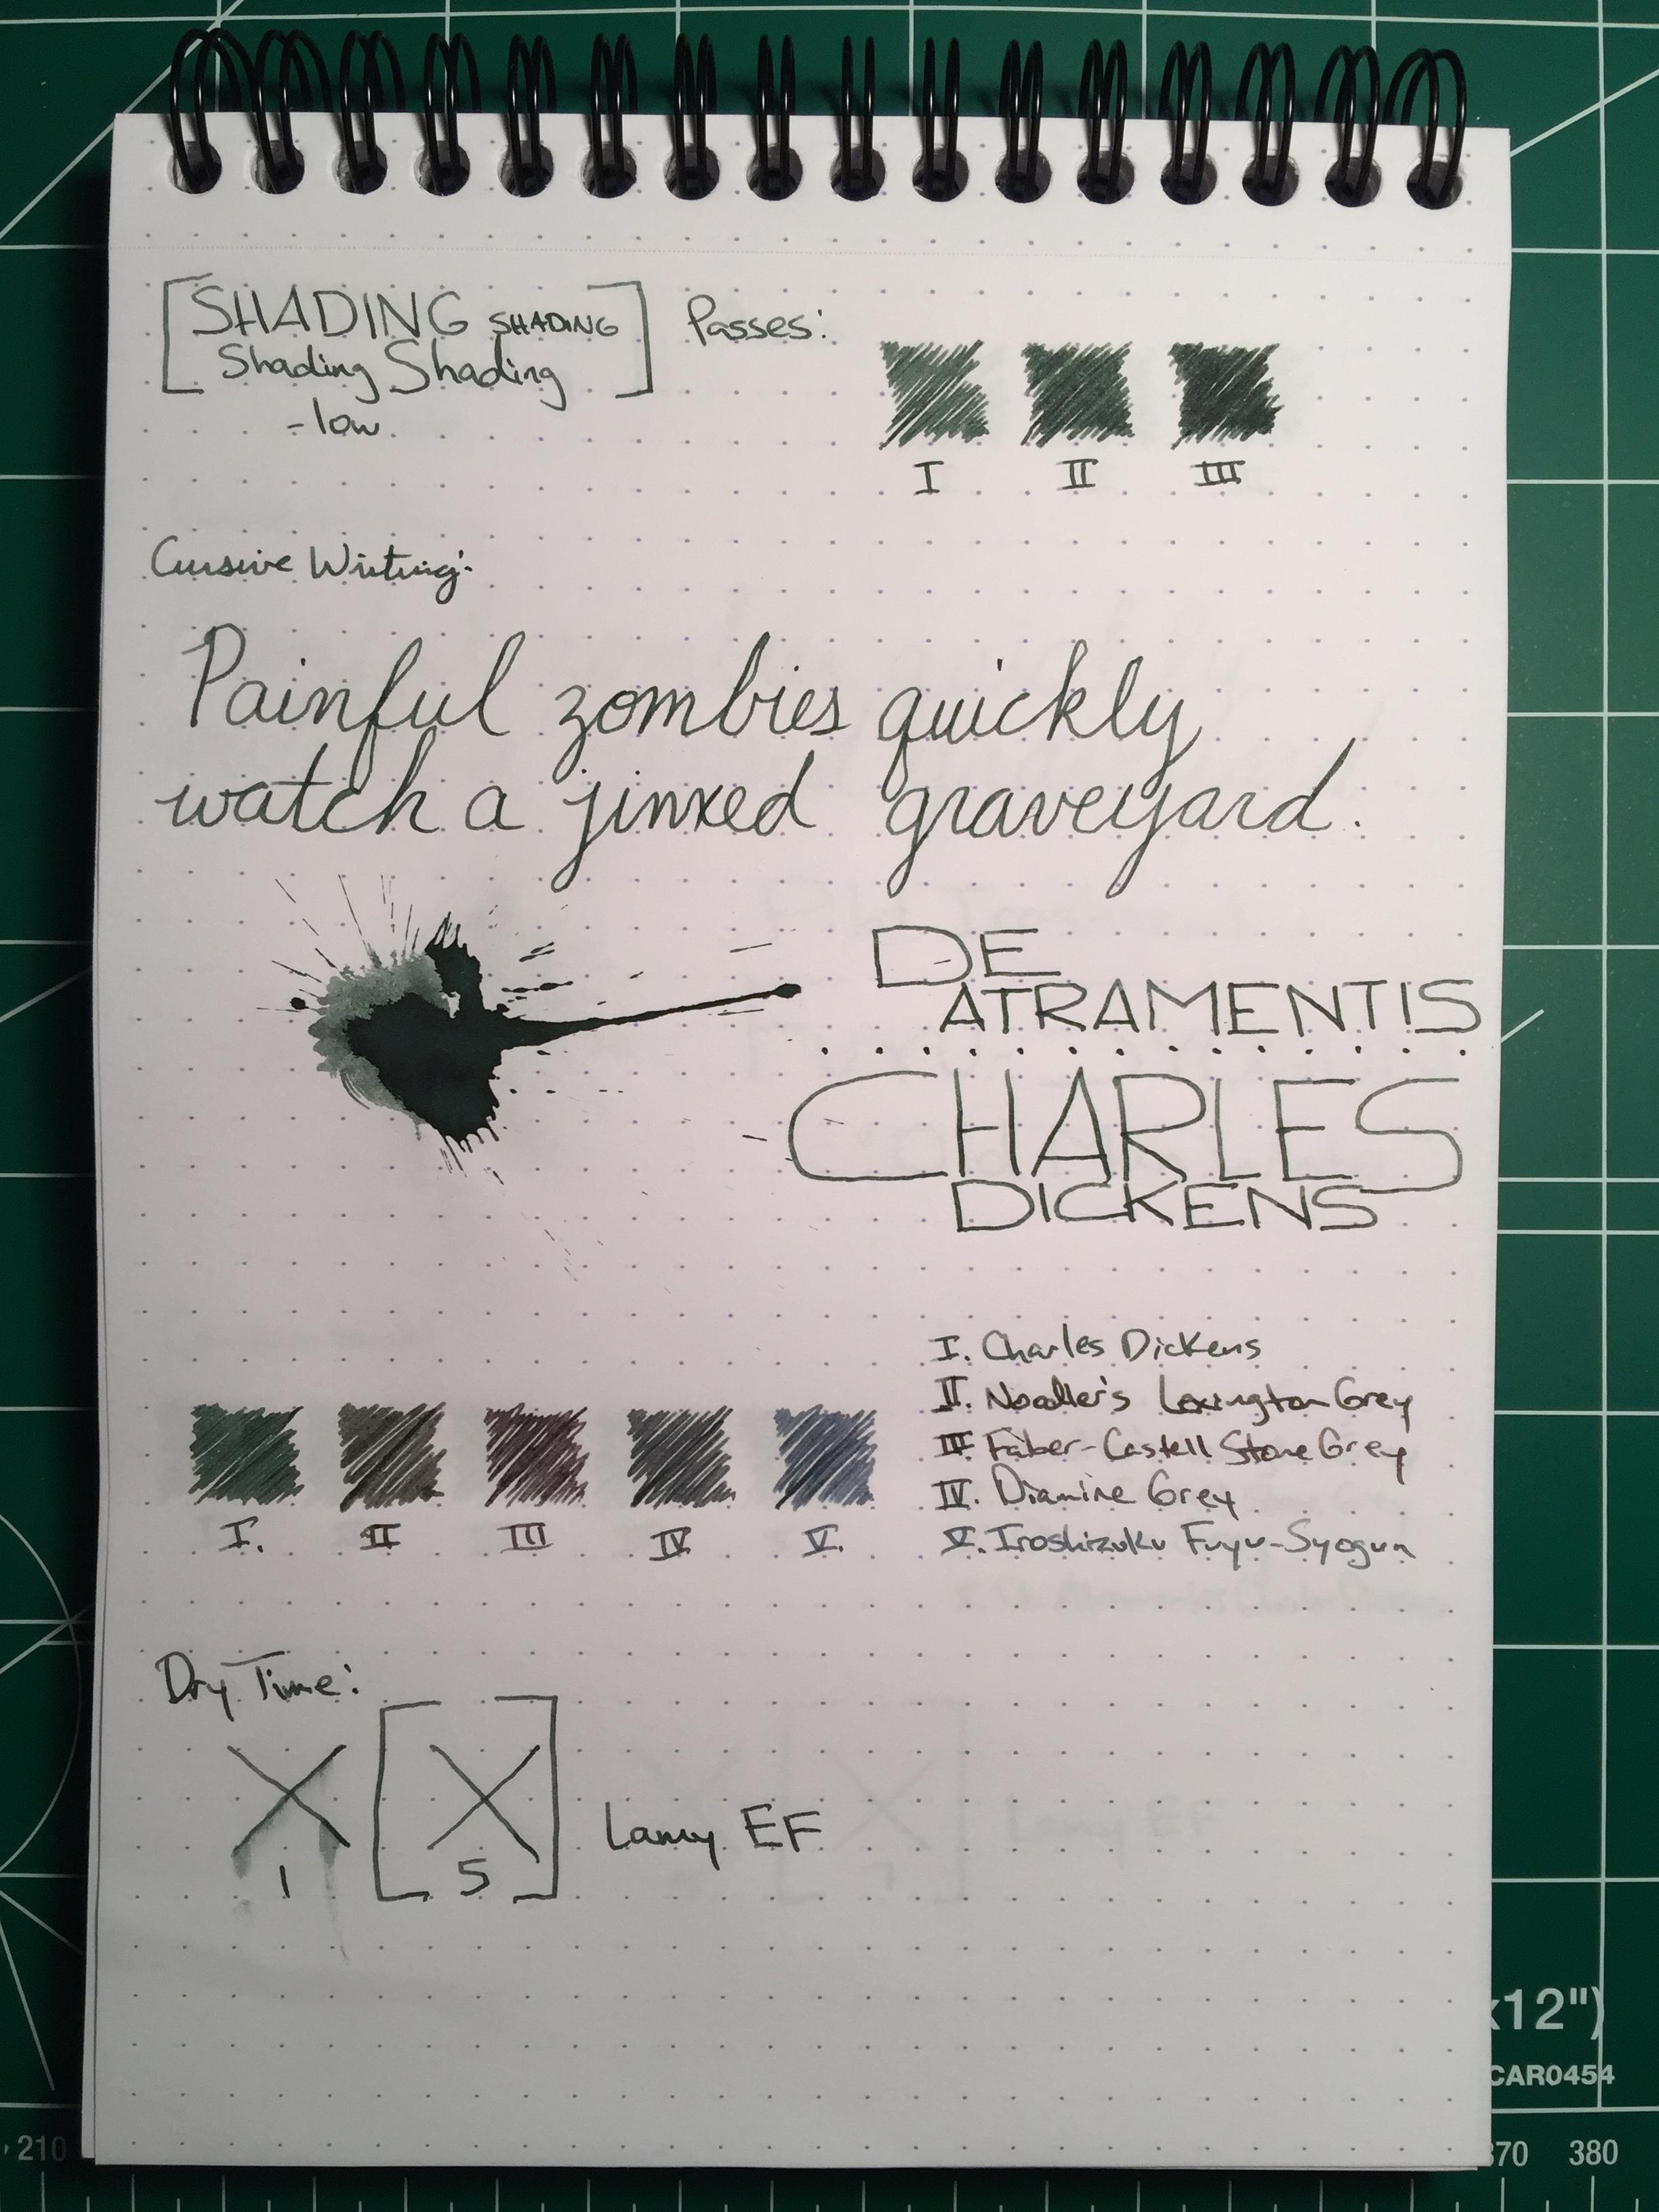 charlesdickens-review